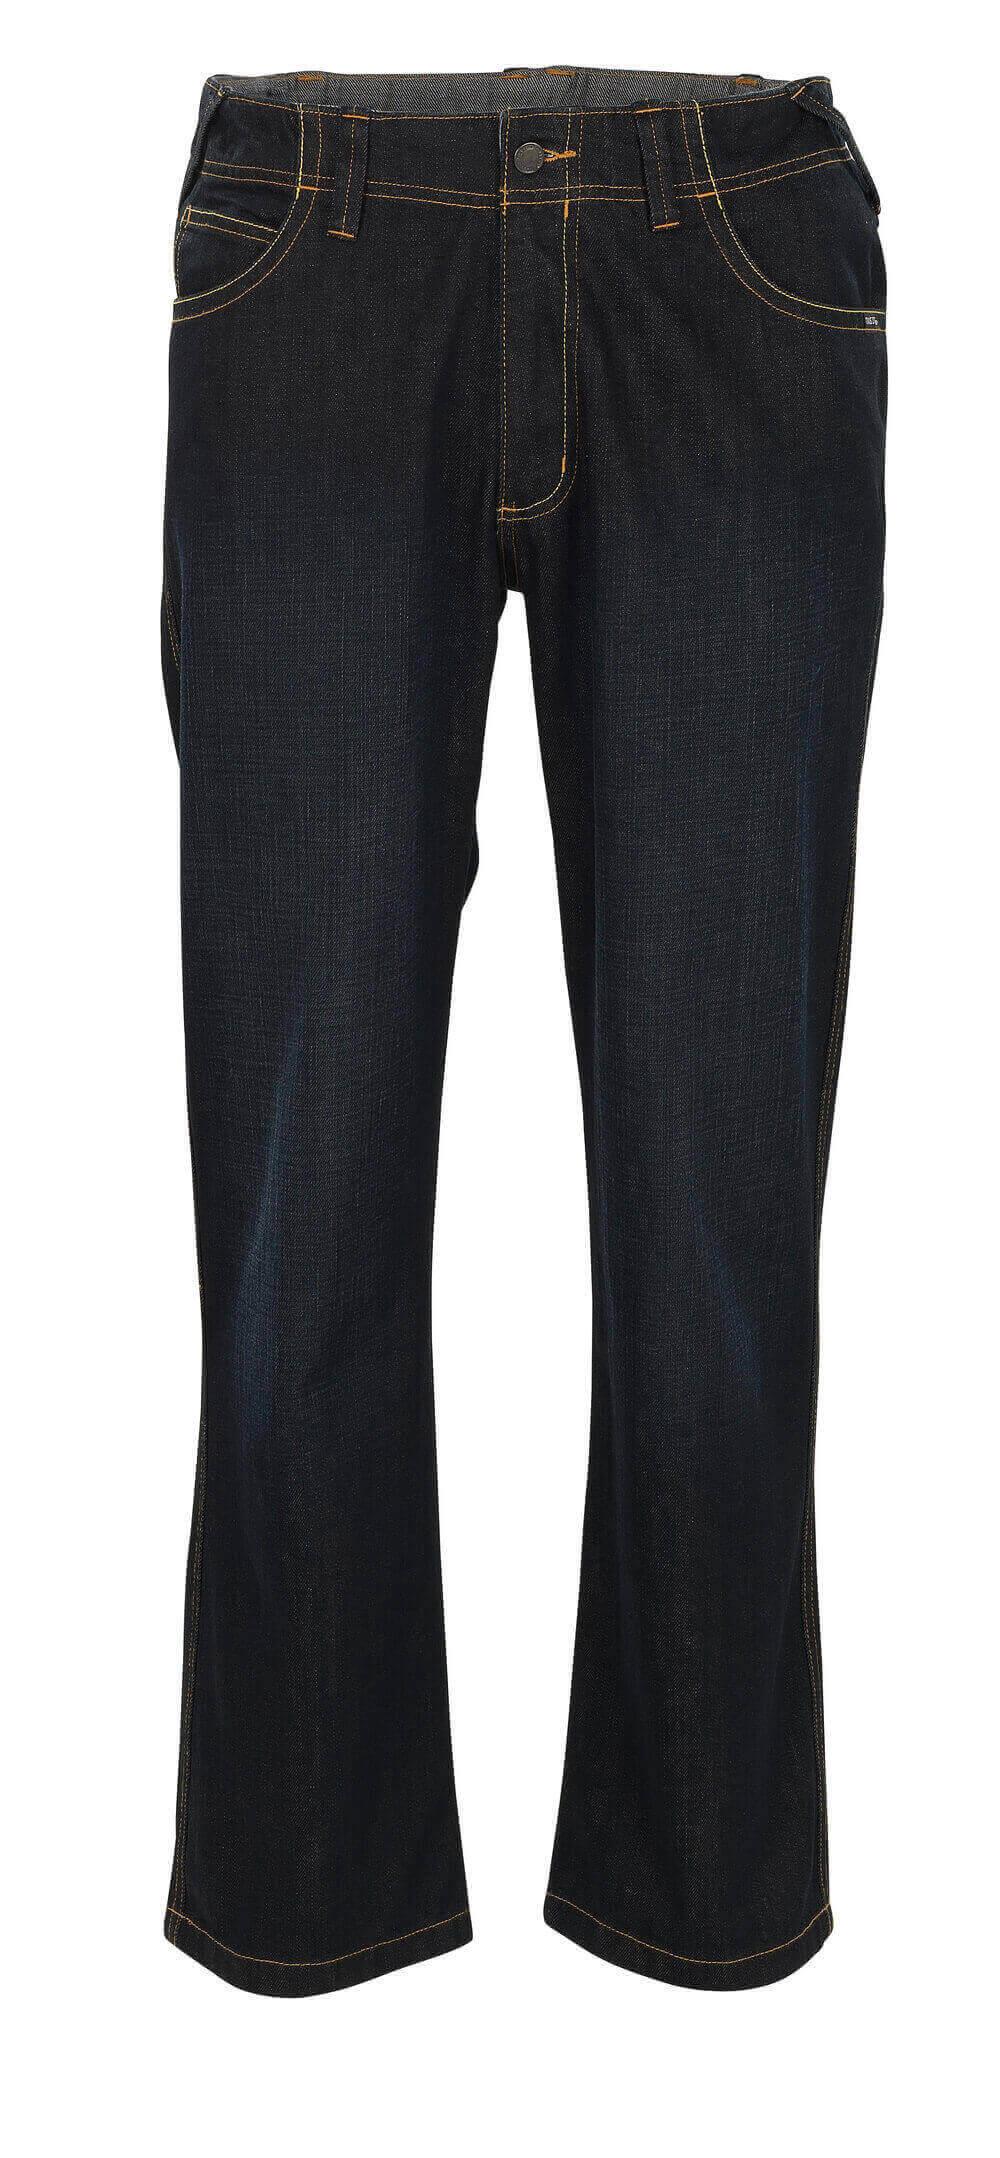 50403-869-A32 Jeans - donker-denimblauw